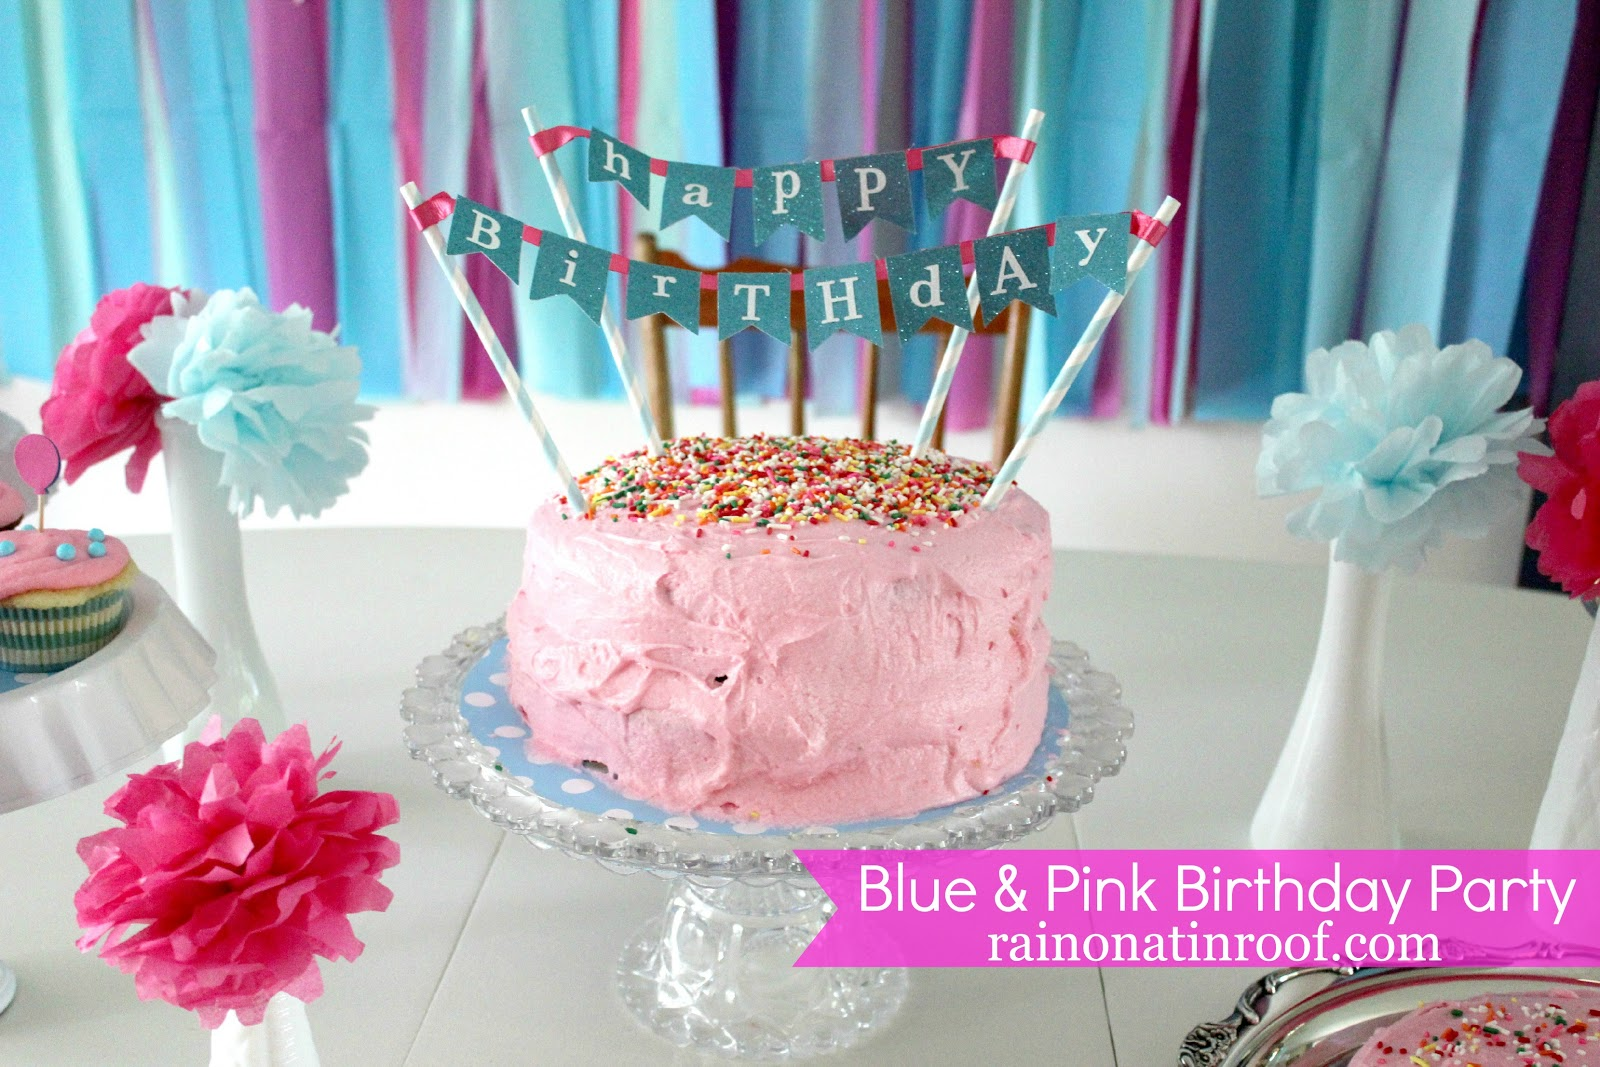 Blue & Pink 1st Birthday Party {rainonatinroof.com} #party #birthday ...